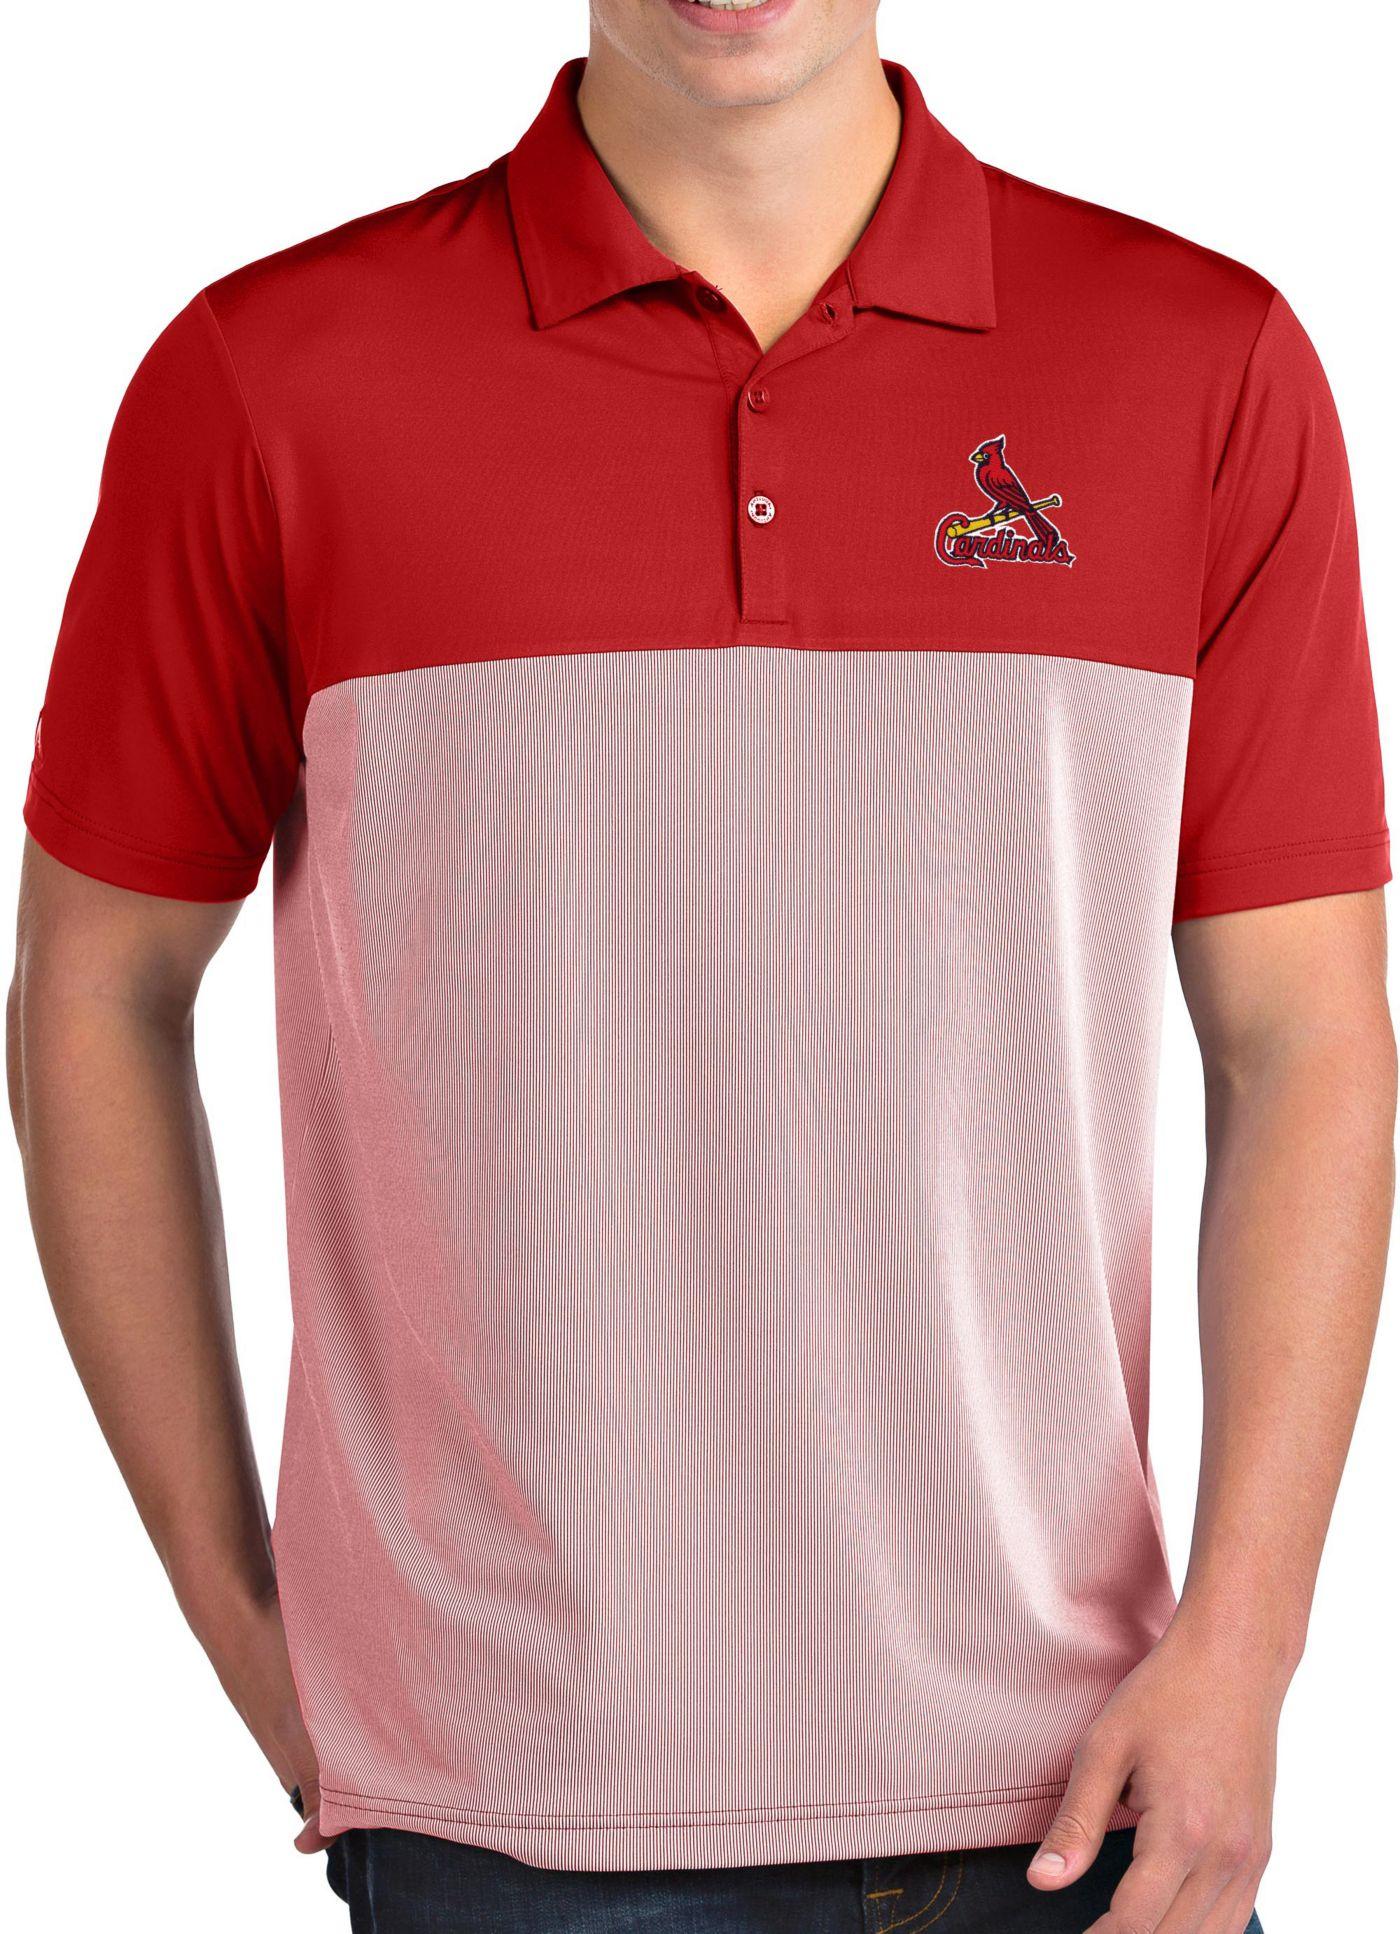 Antigua Men's St. Louis Cardinals Venture Red Performance Polo